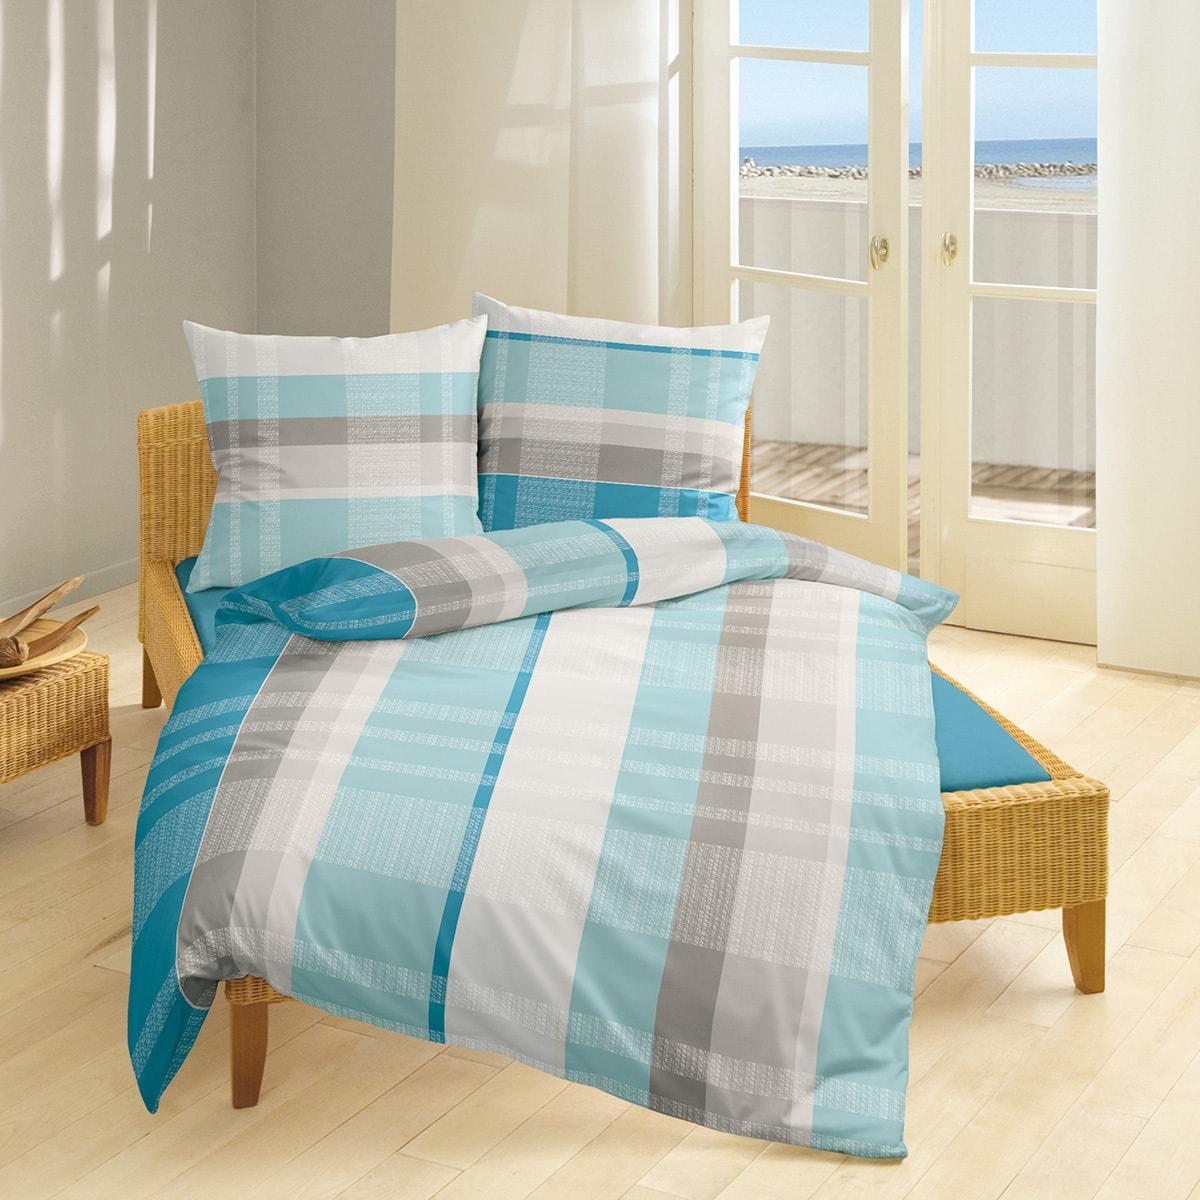 bierbaum single jersey bettw sche 3017 aqua g nstig online kaufen bei bettwaren shop. Black Bedroom Furniture Sets. Home Design Ideas